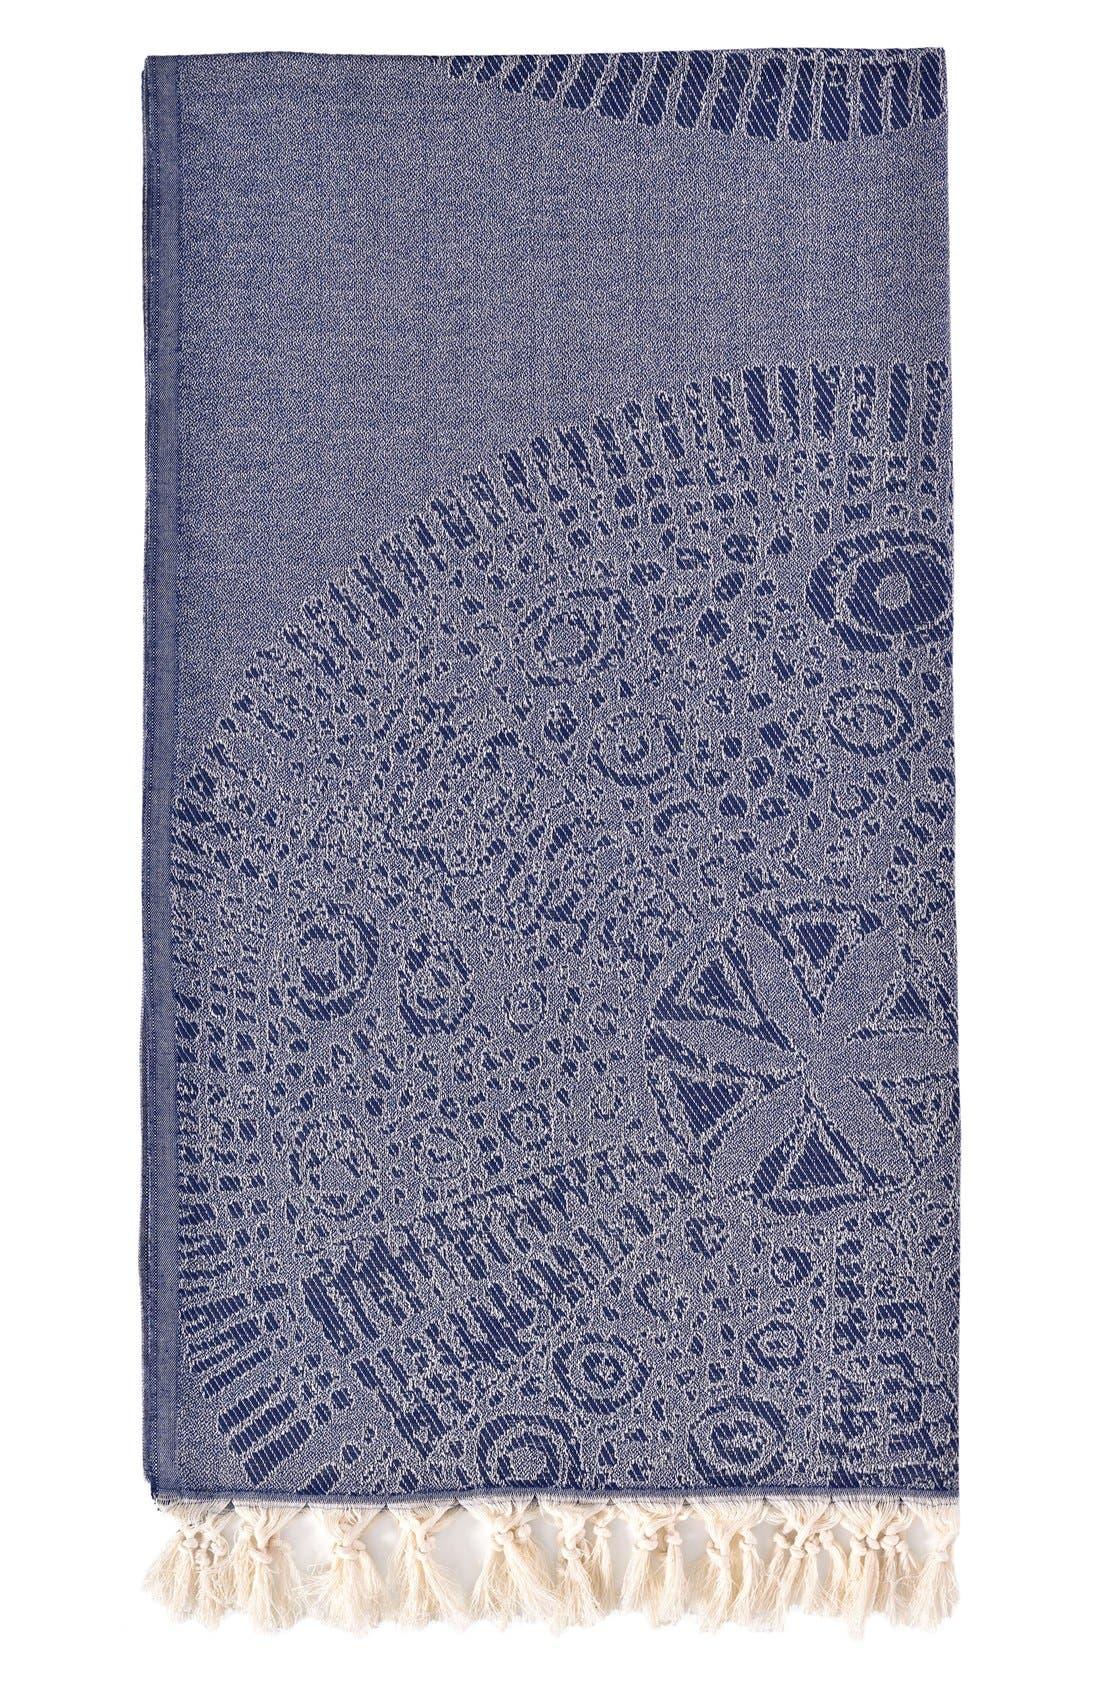 Alternate Image 1 Selected - Linum Home Textiles Anatolian Turkish Pestemal Beach Towel